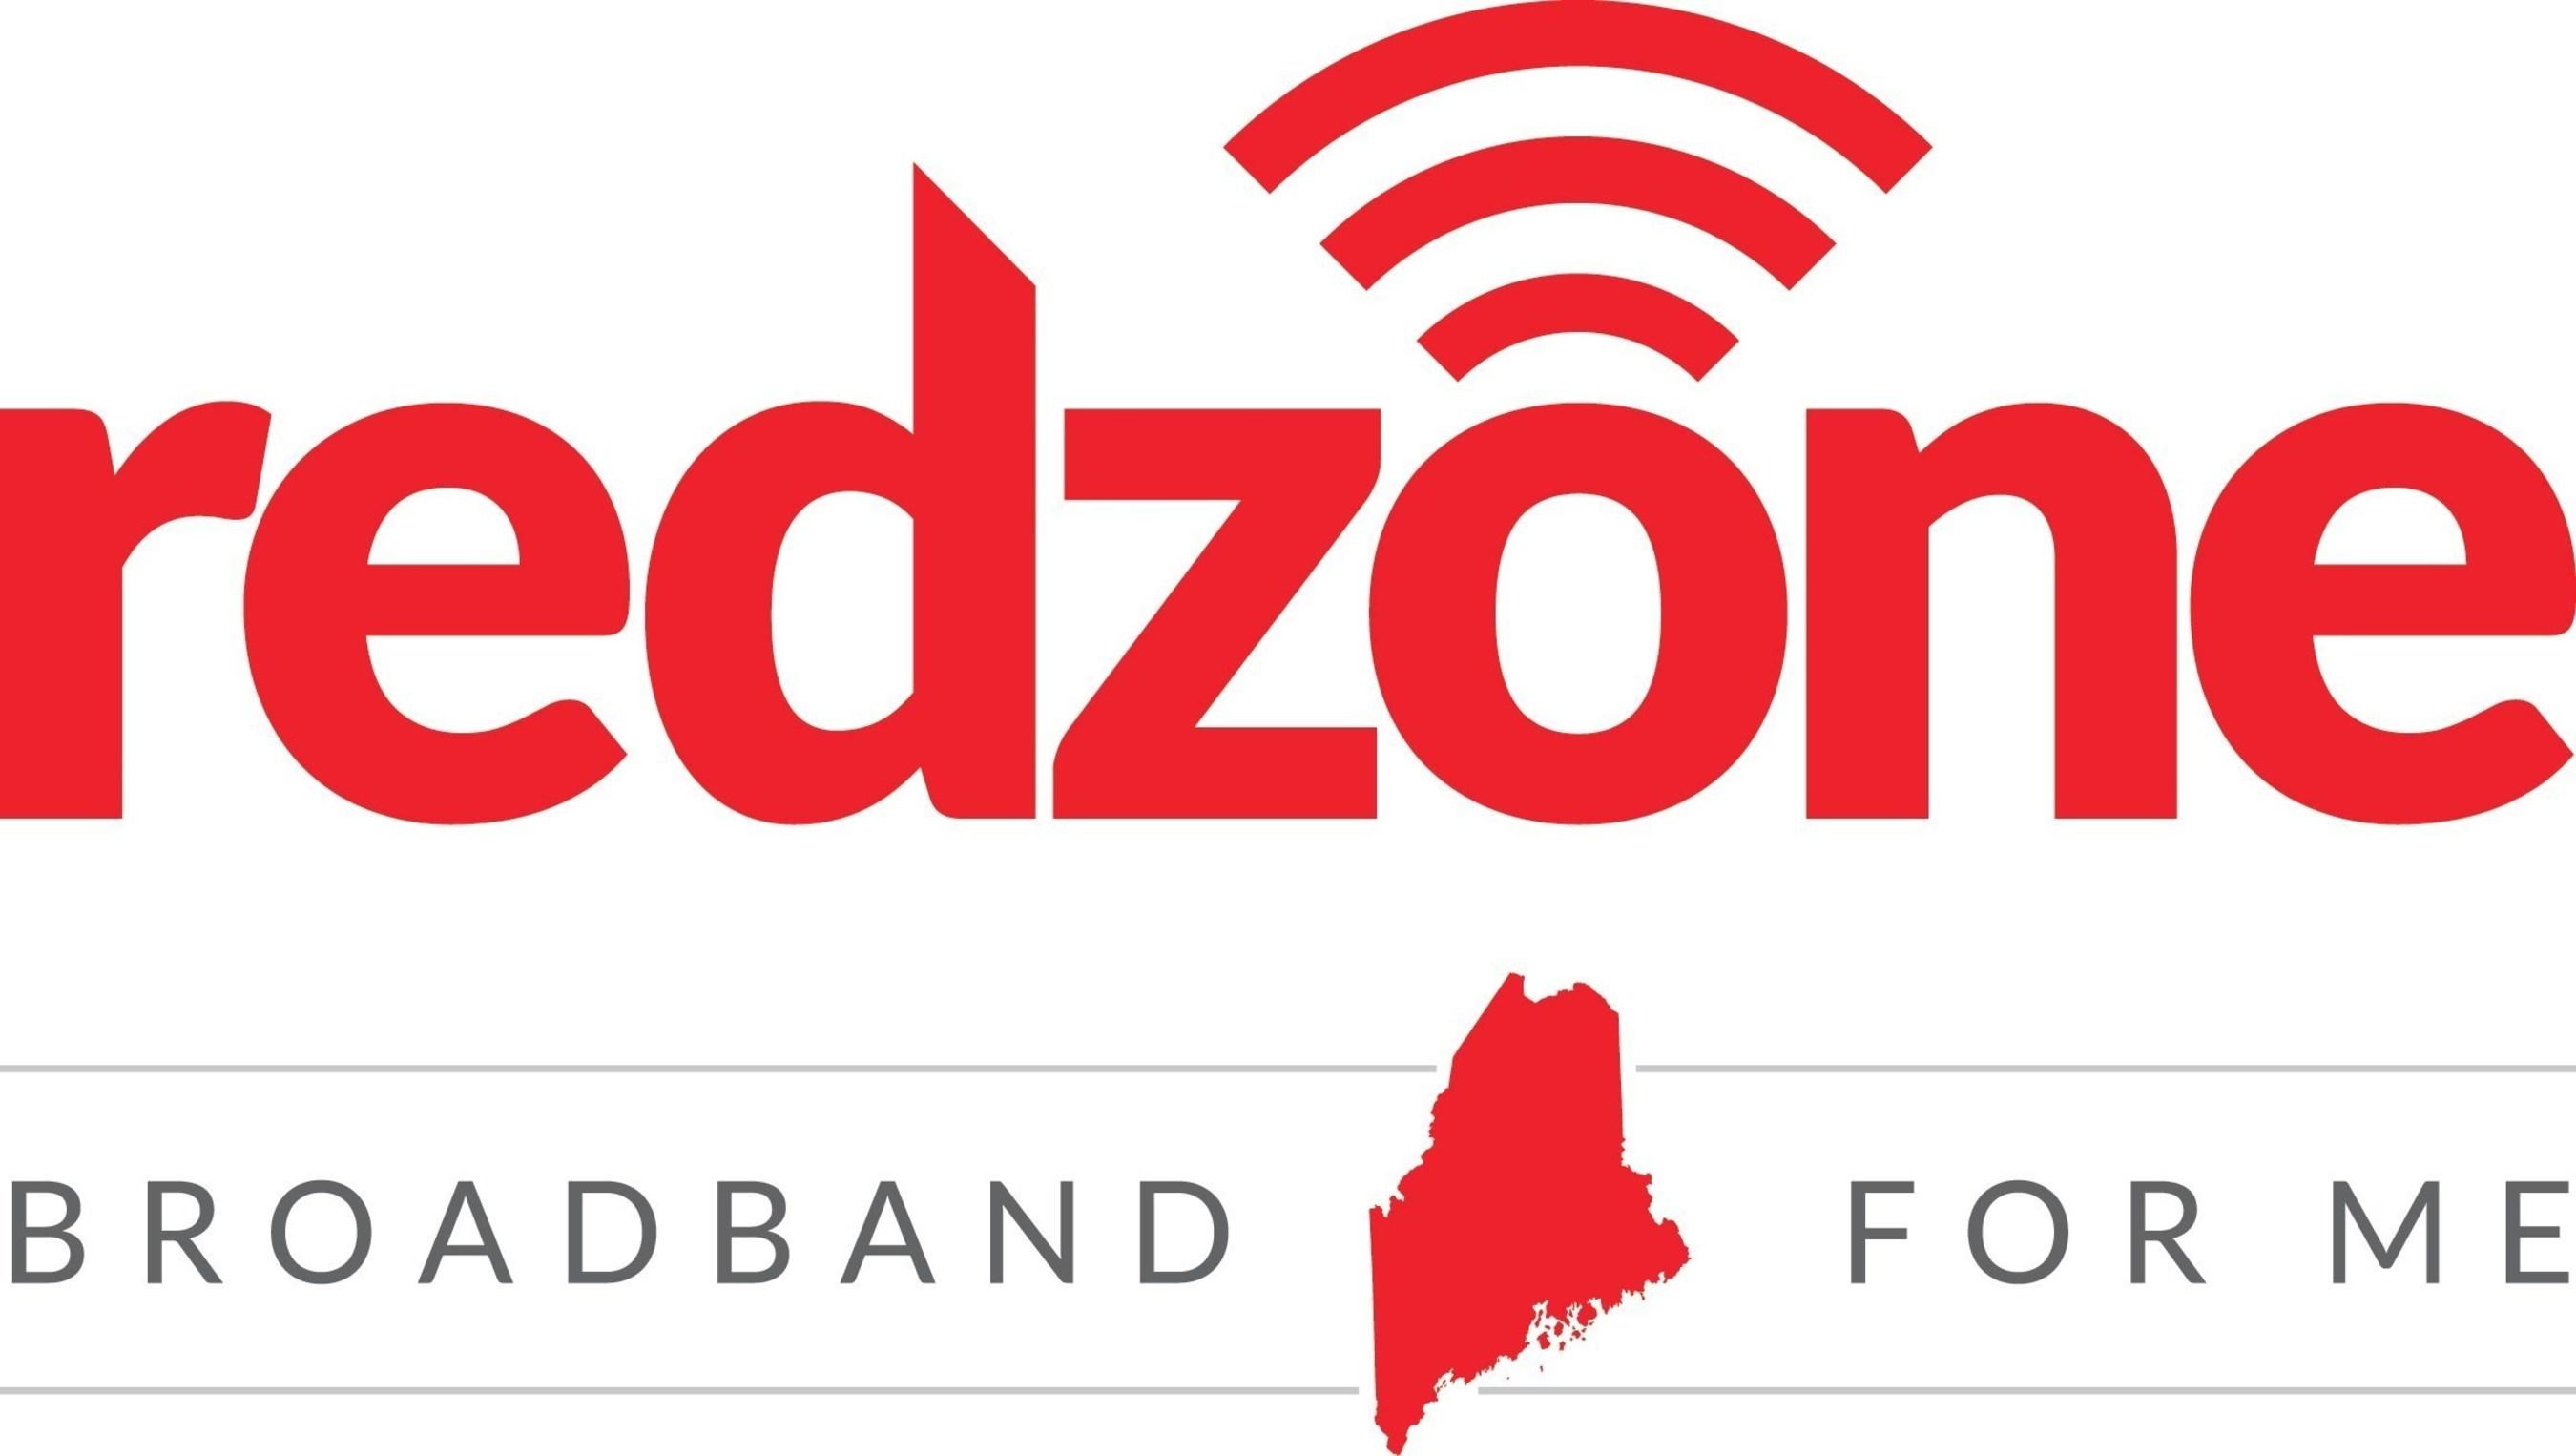 Redzone Wireless, LLC Announces Completion of 2015 Broadband Network Deployment in Maine